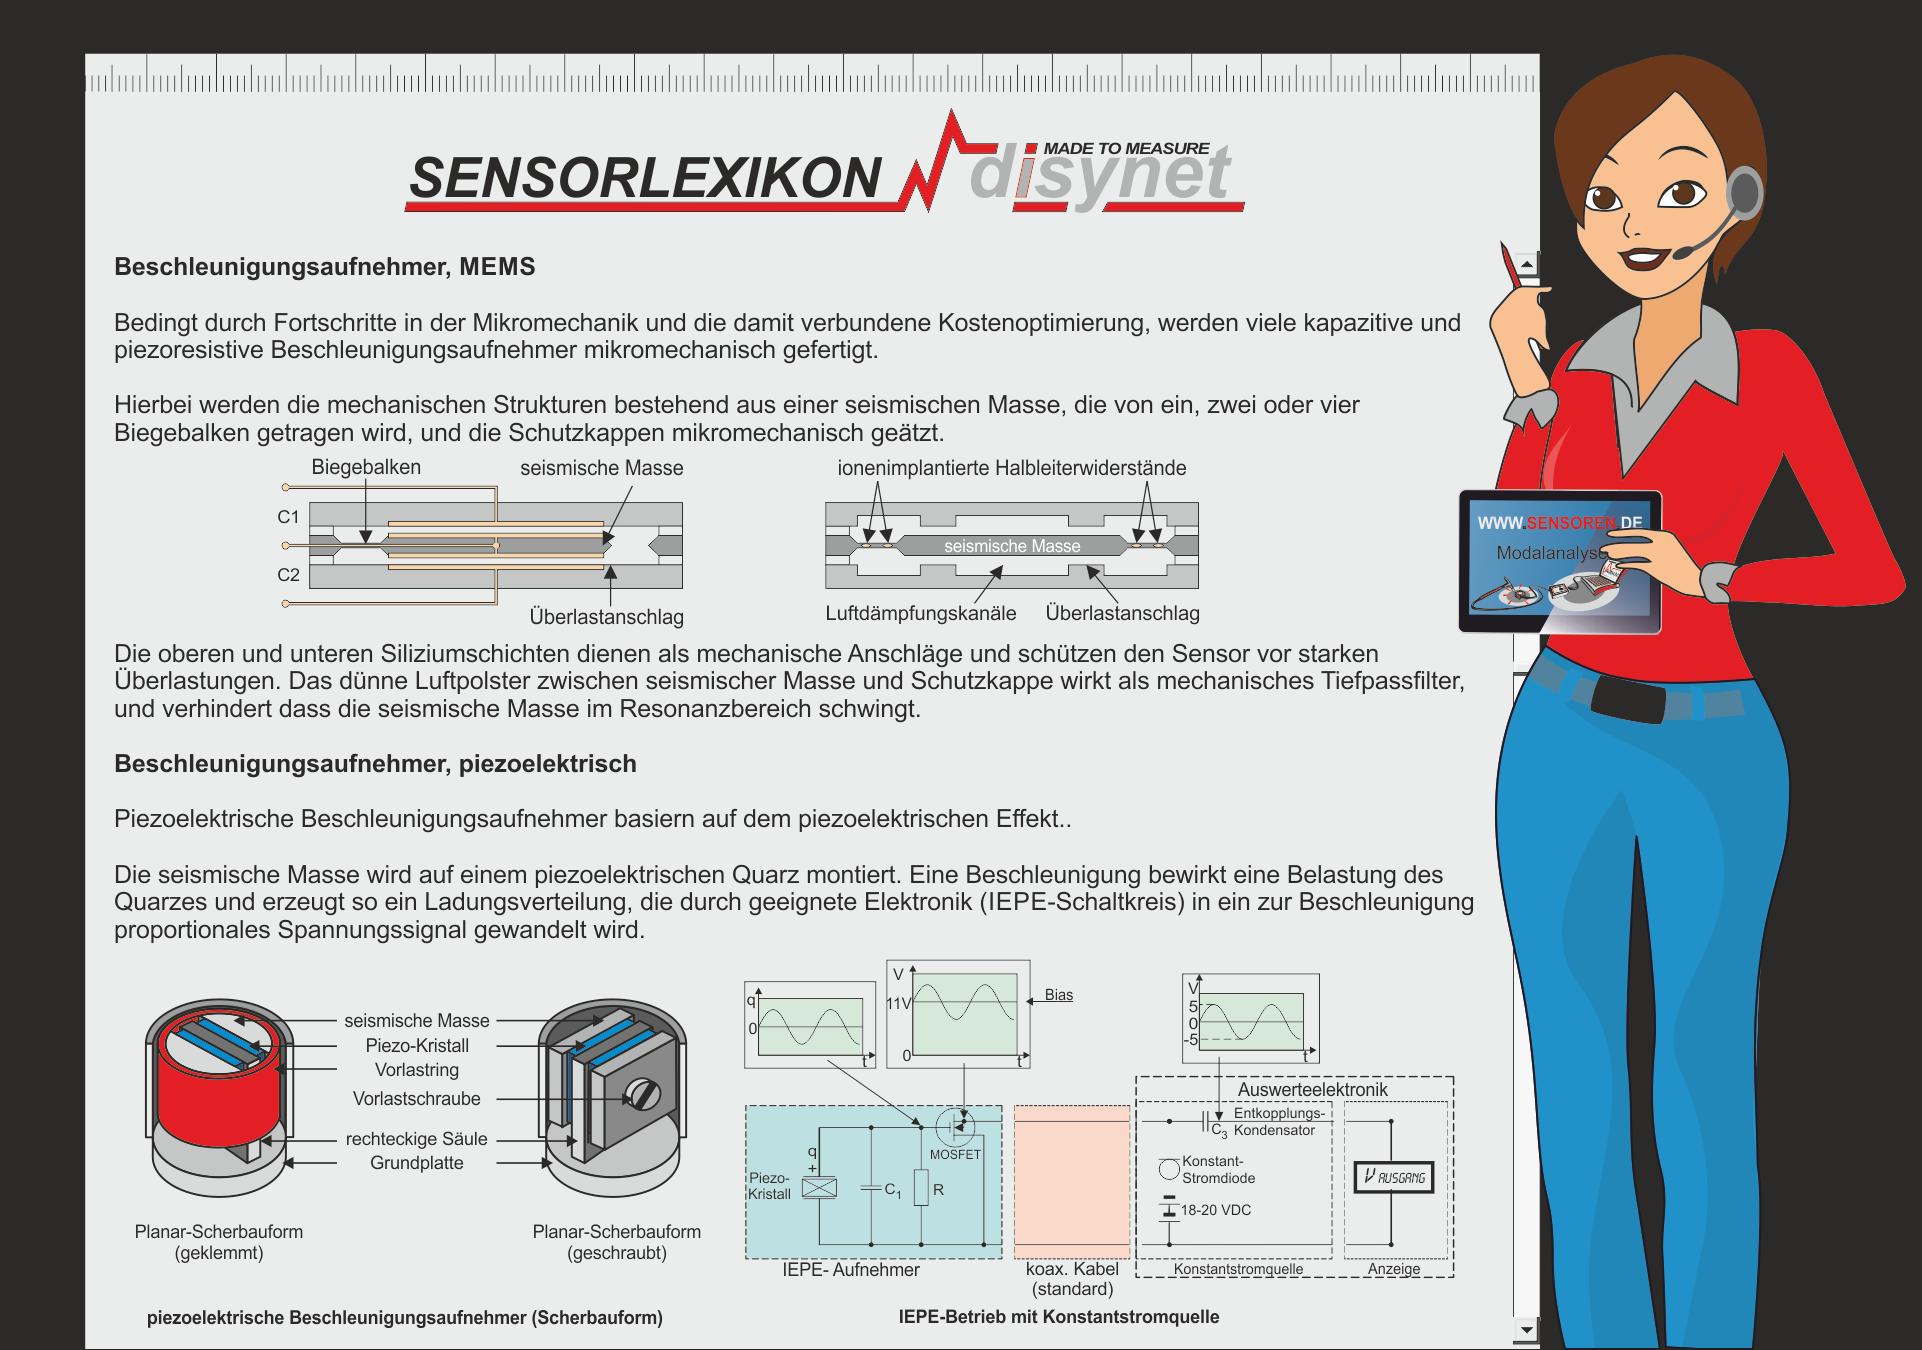 Sensorlexikon